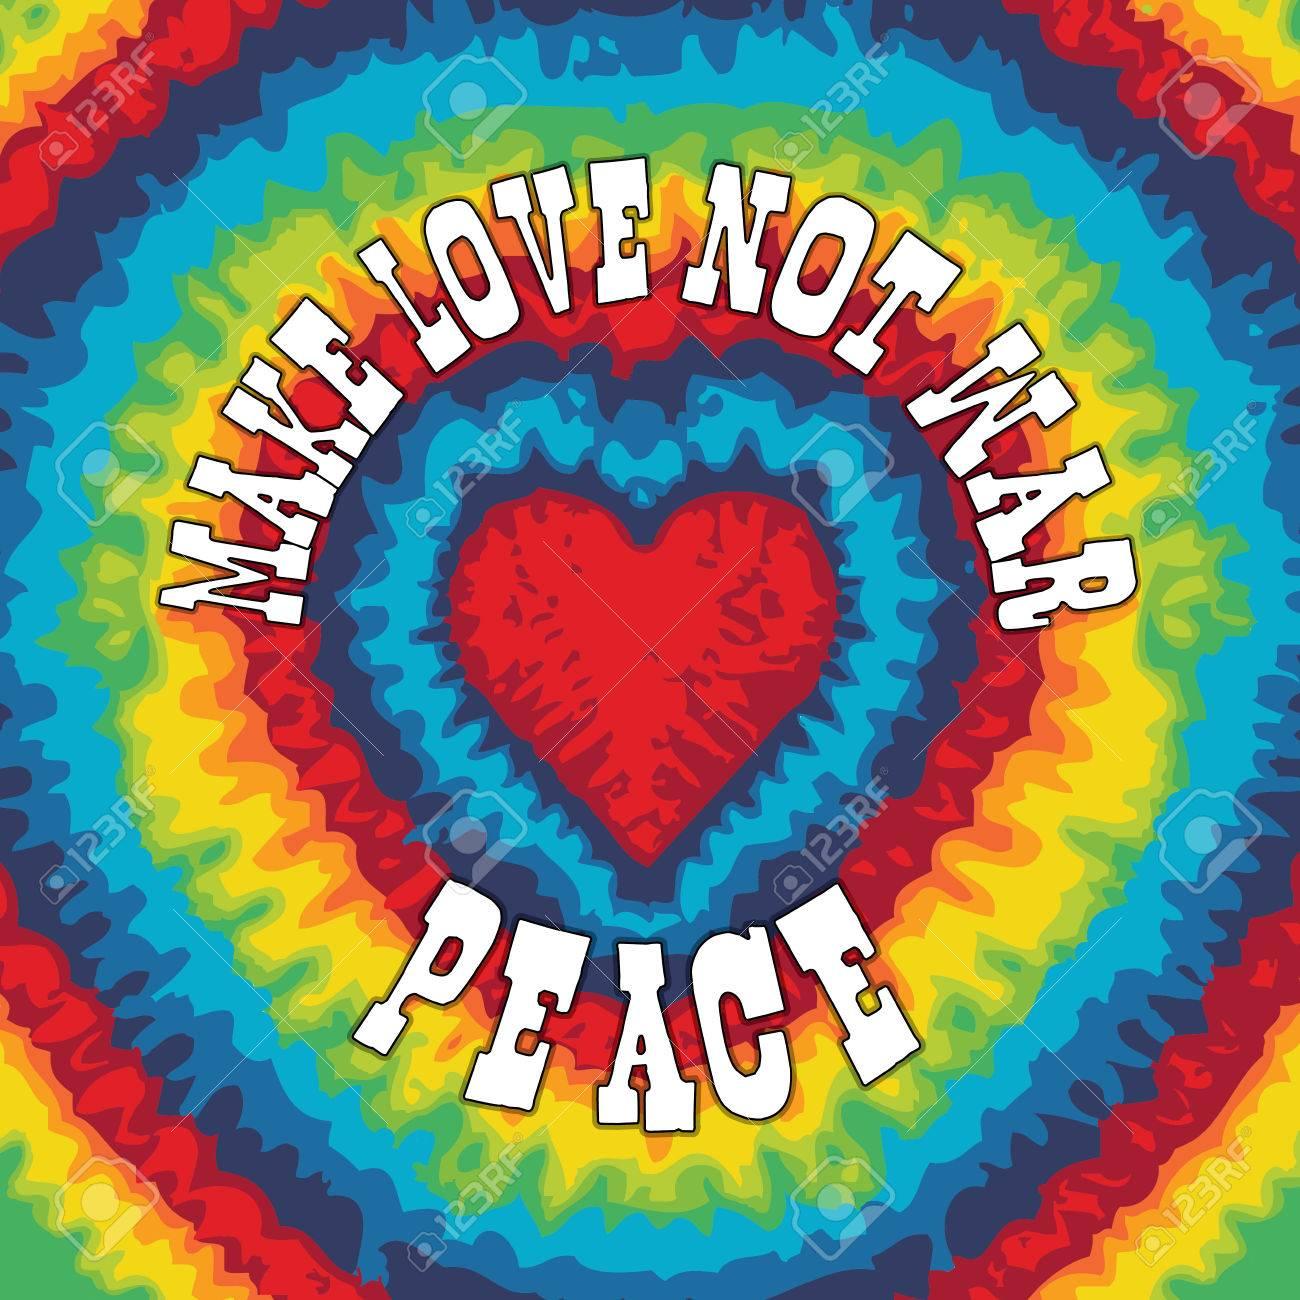 Hippie style tie dye illustration for make love not war - 51007819